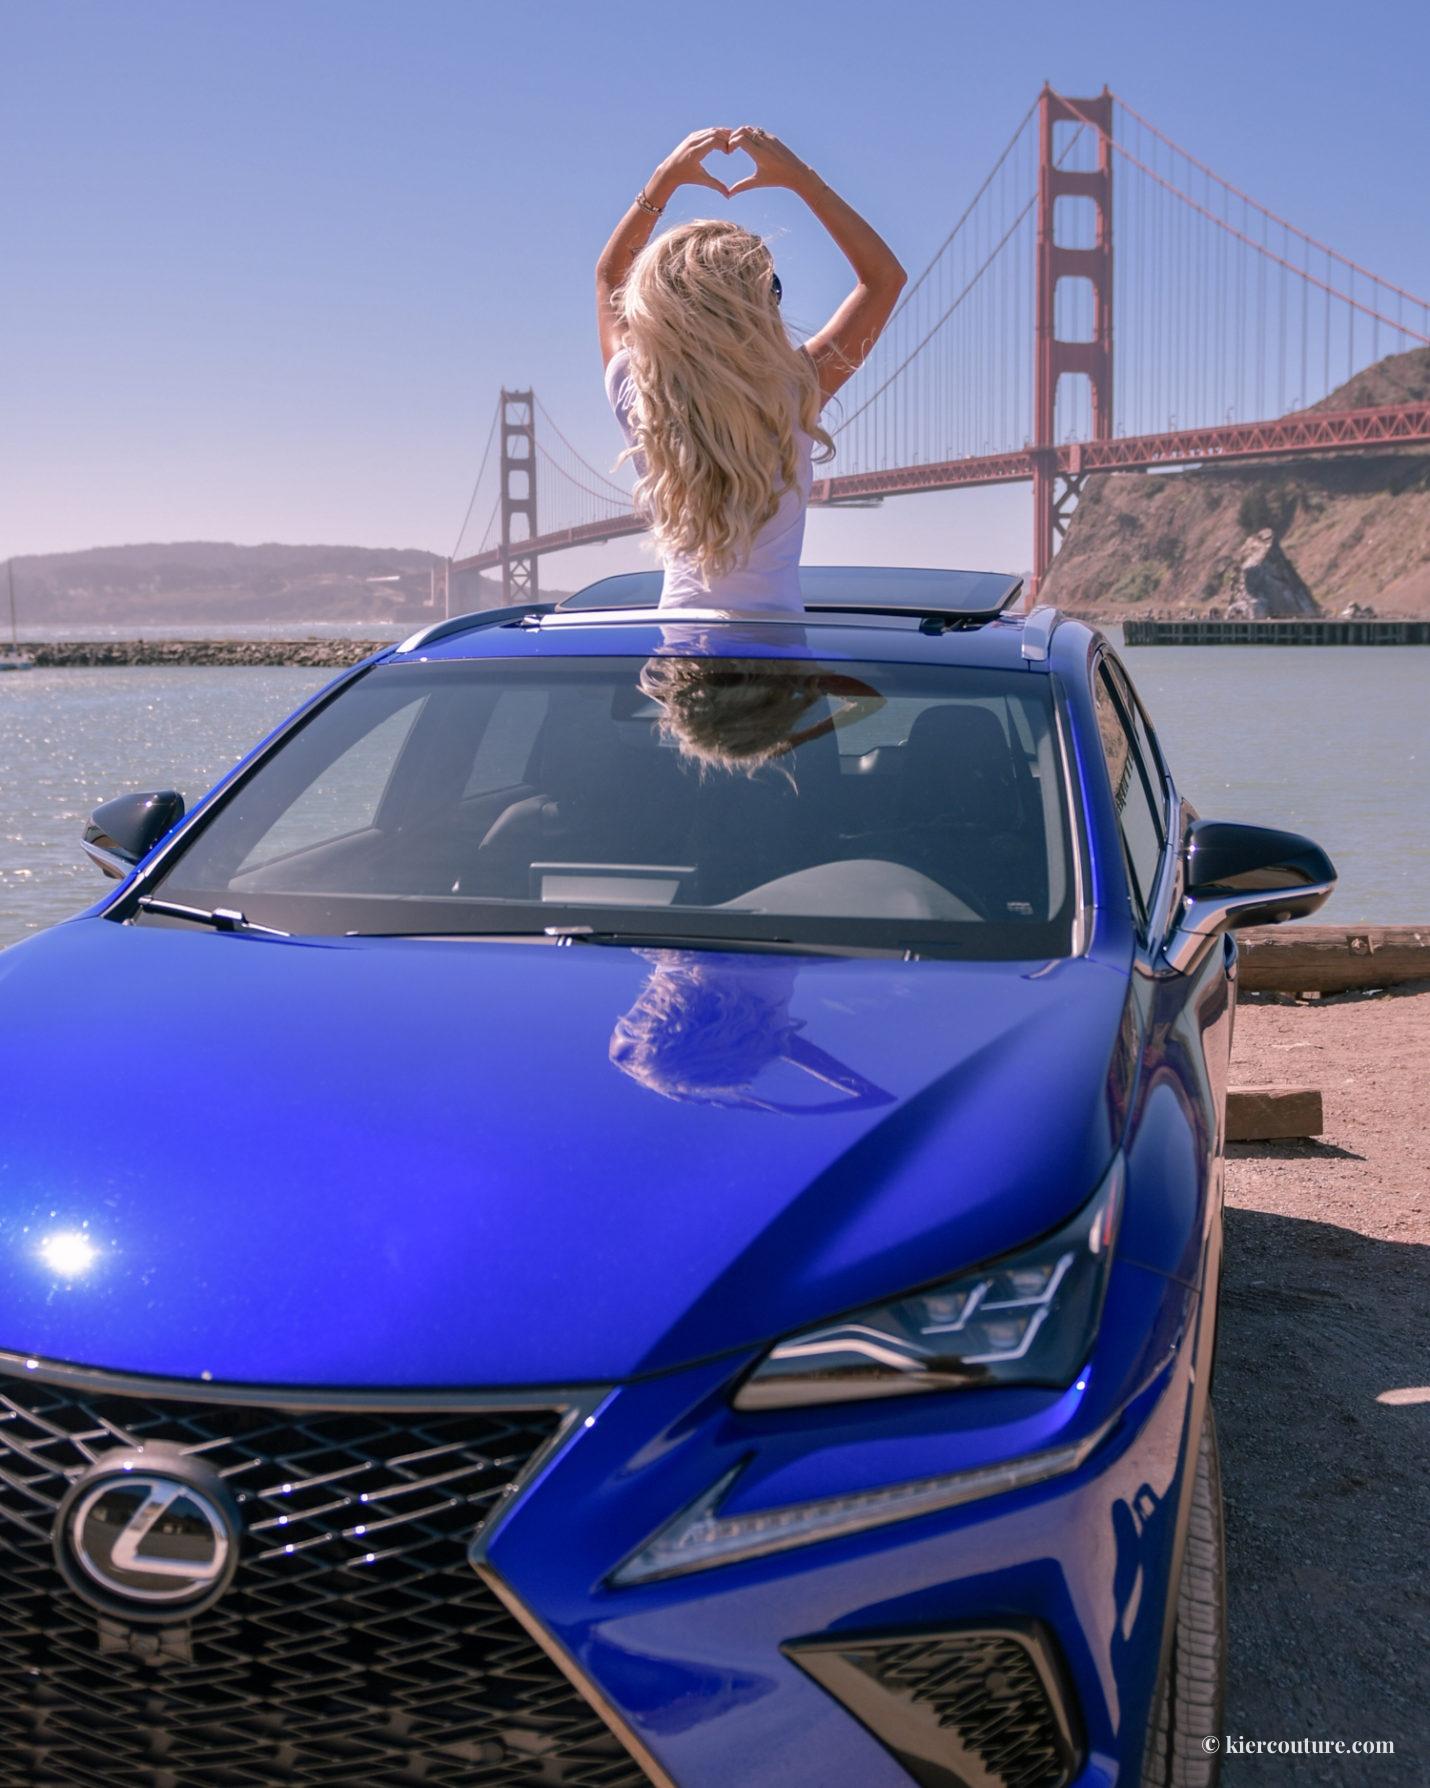 Lexus sport SUV